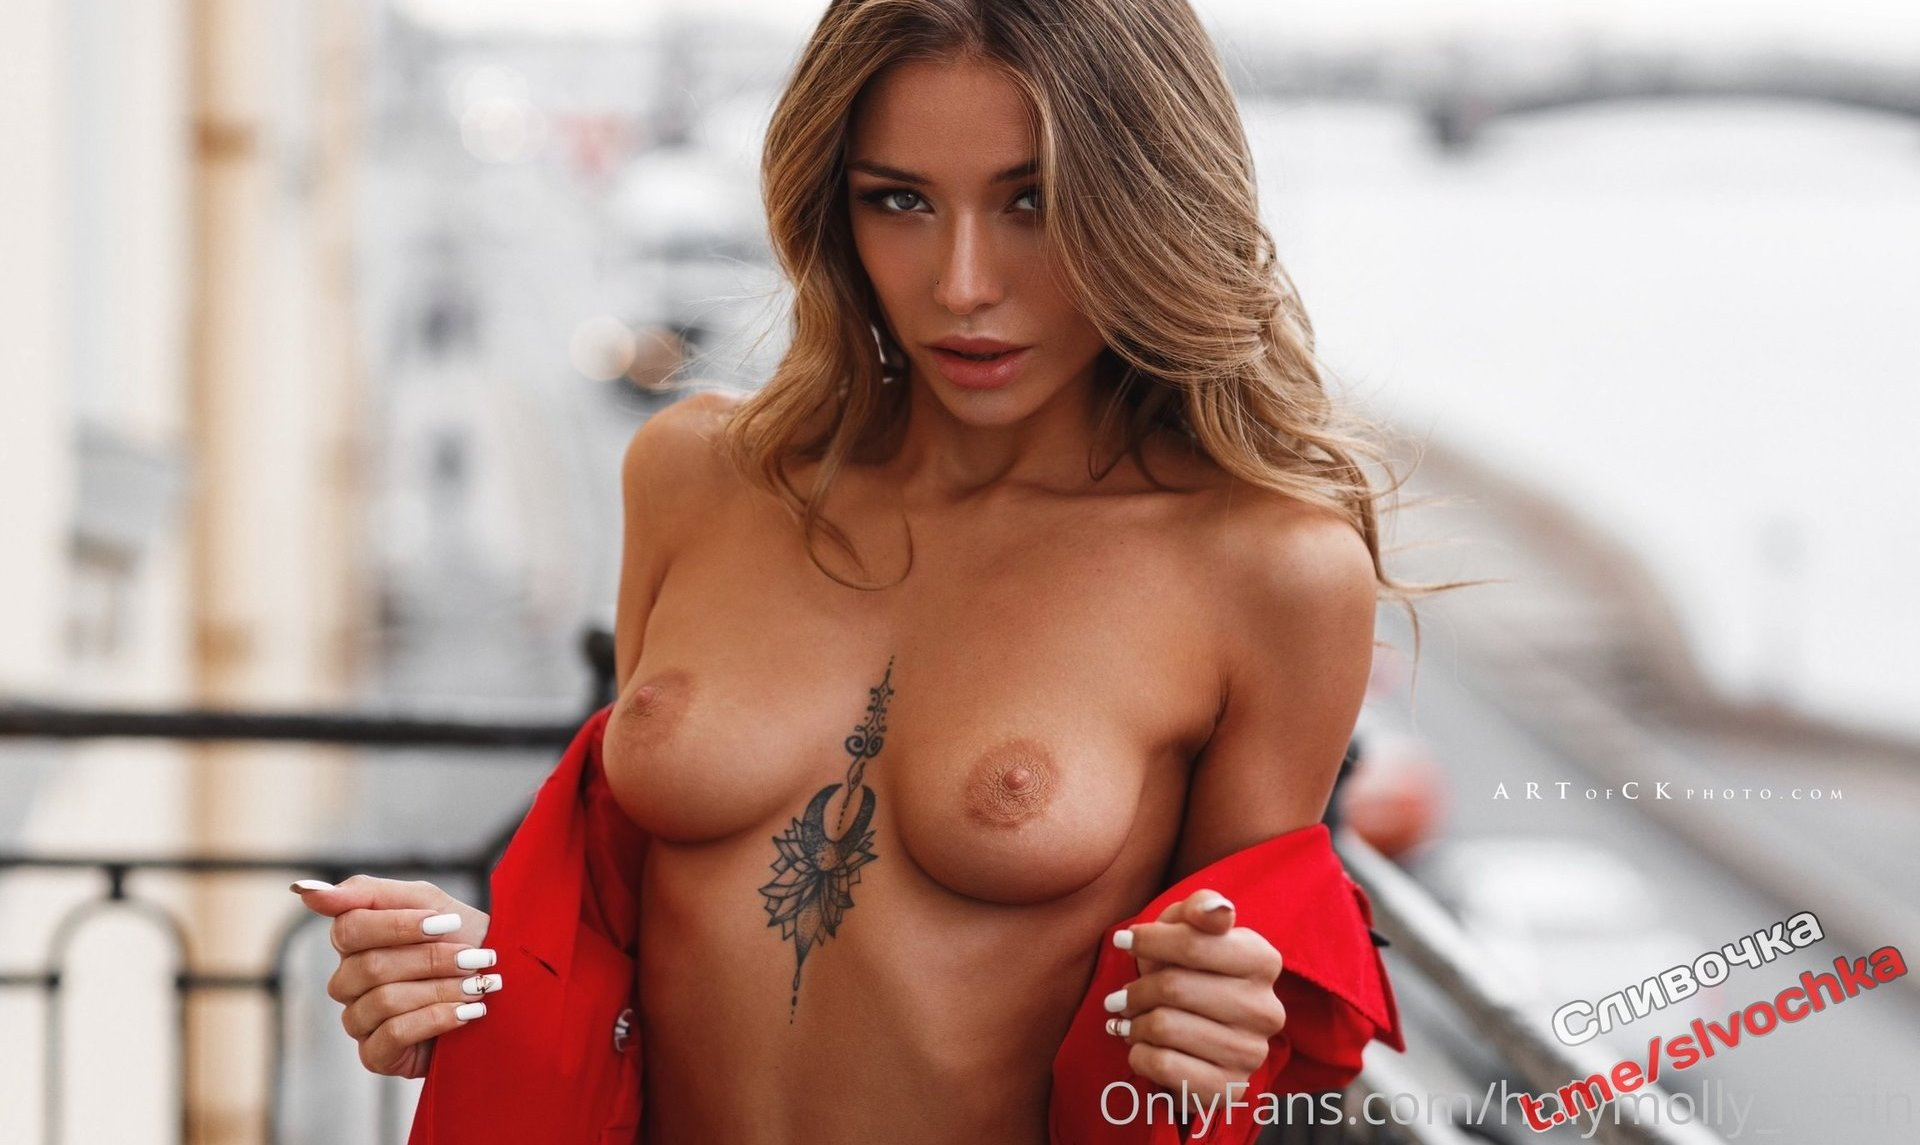 Holymolly Main Nude Leaks Nudostar Com 030